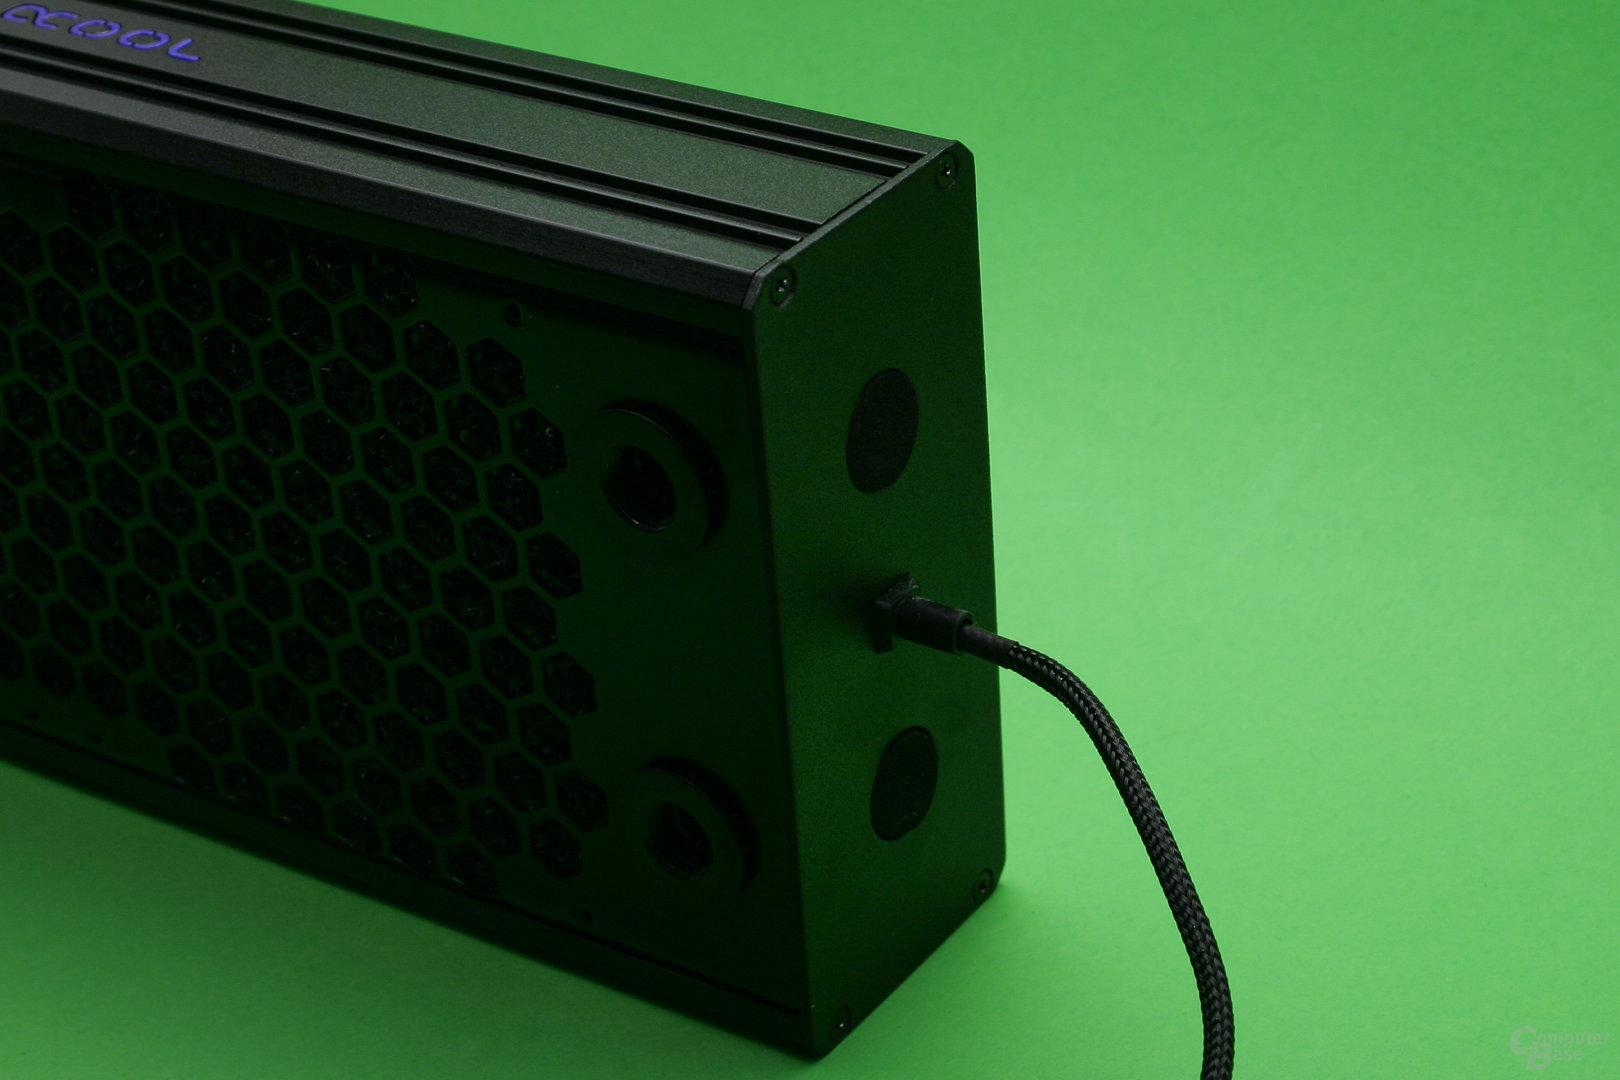 Alphacool Eisbrecher 240: Stromkabel für LED-Beleuchtung